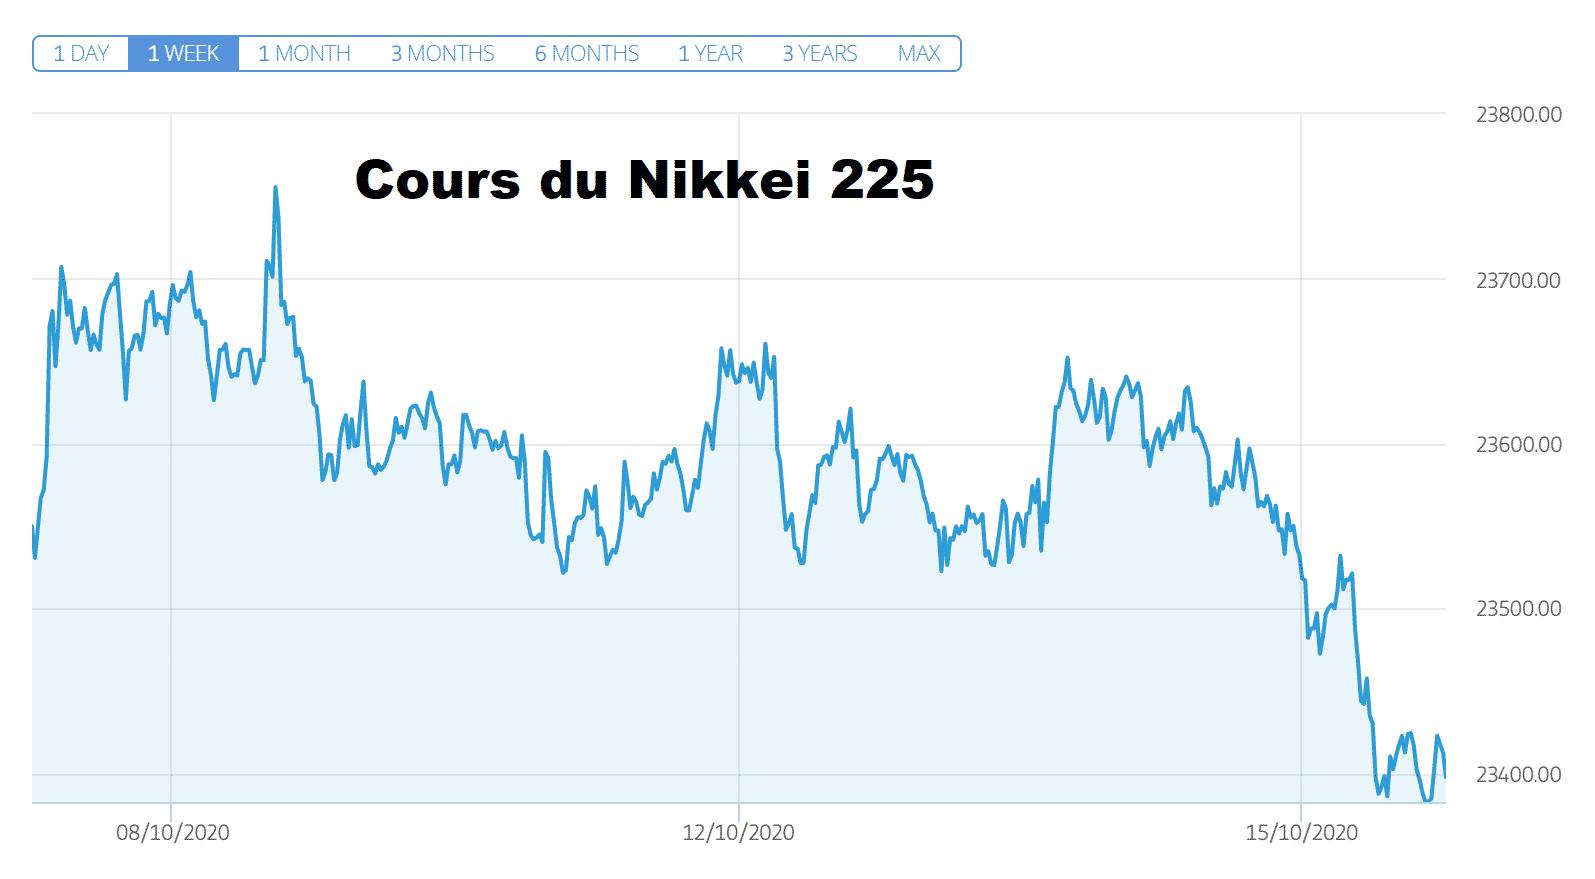 cours du Nikkei 225 jeudi 15 octobre 2020